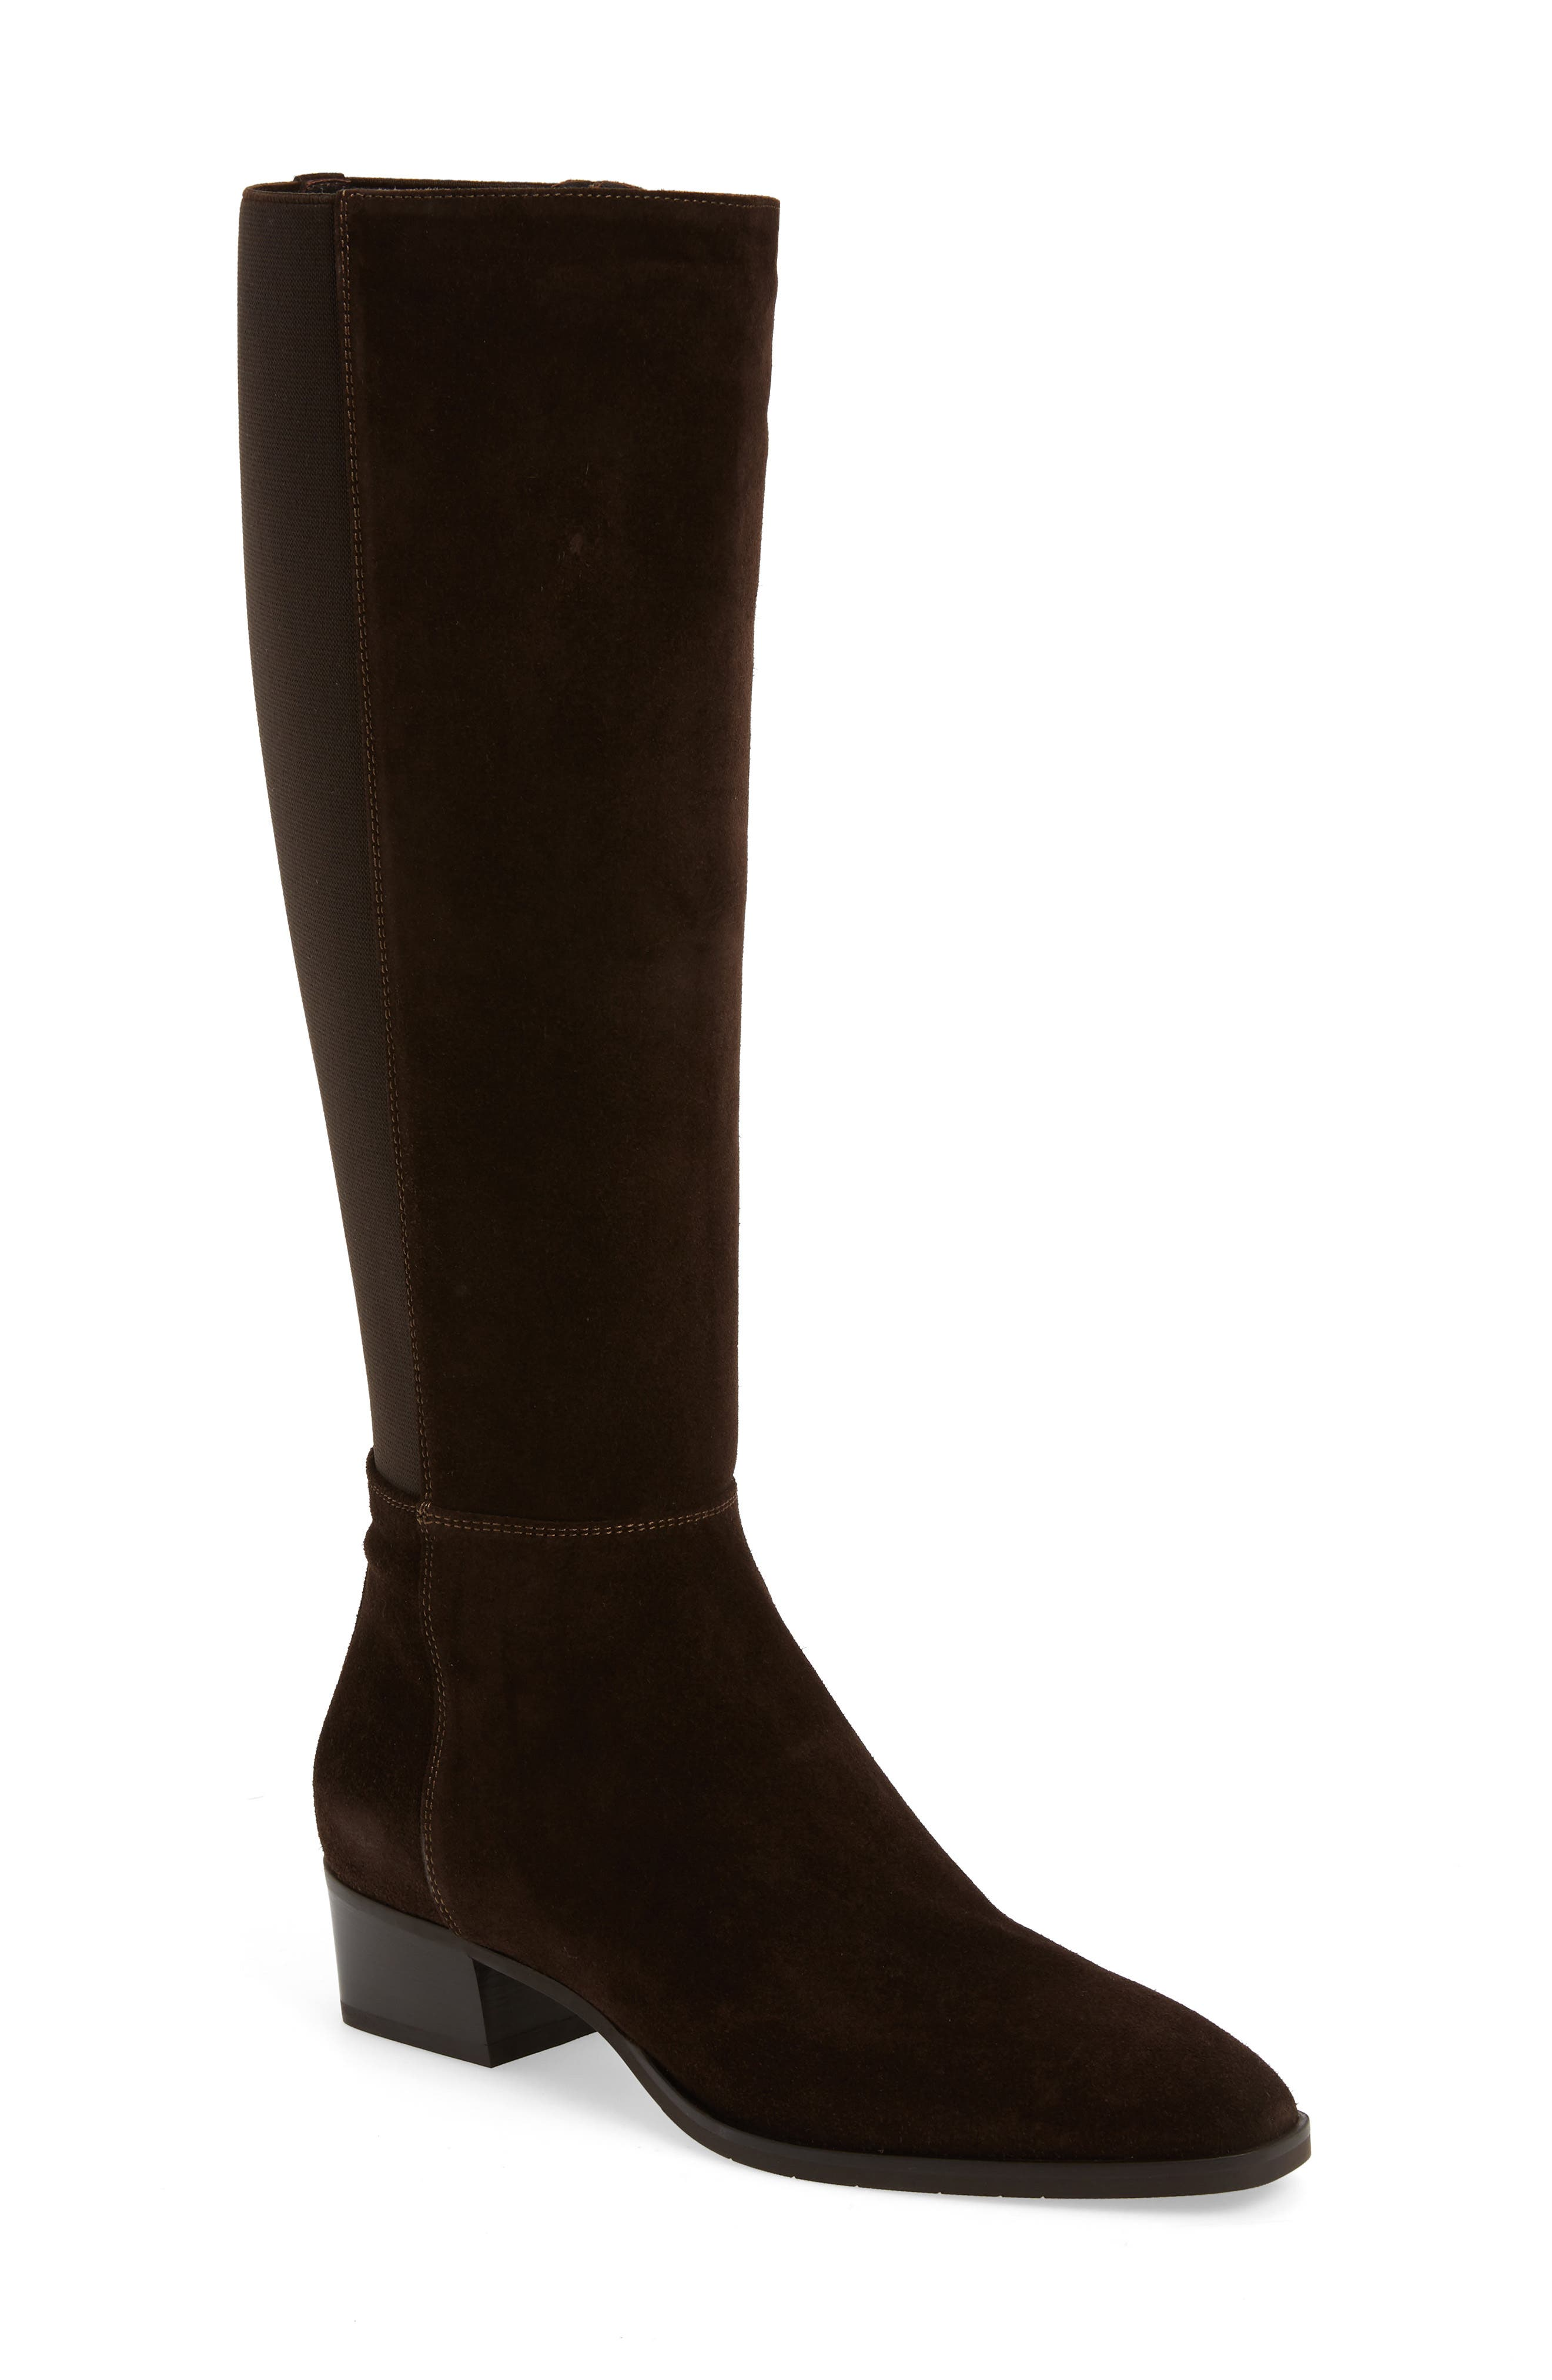 Aquatalia Finola Water Resistant Stretch Back Boot